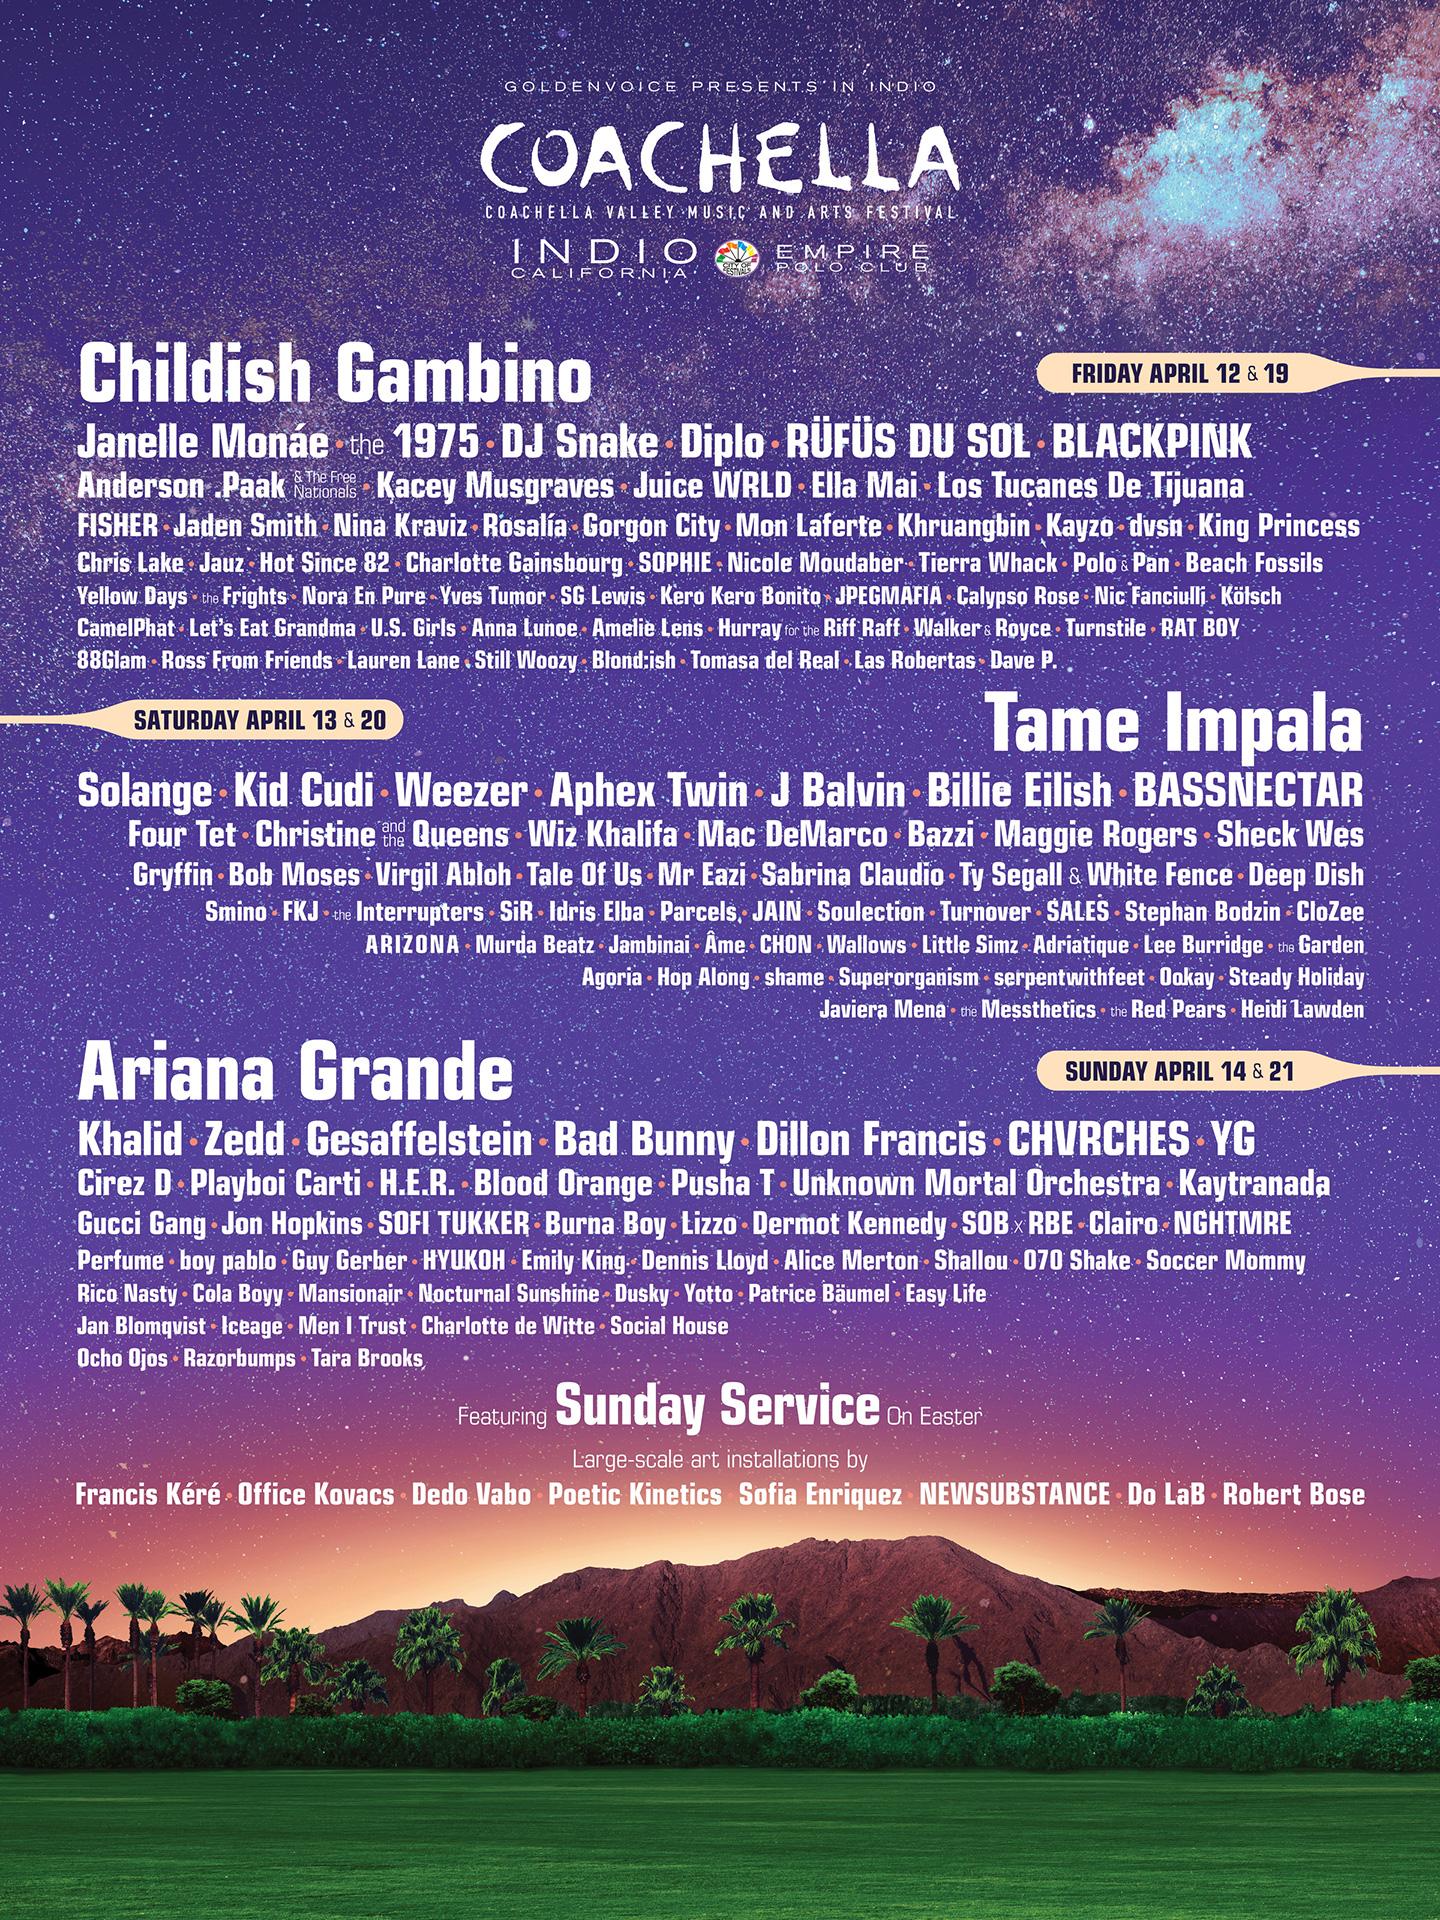 Coachella Festival 2020.Coachella 2019 Lineup Coachella